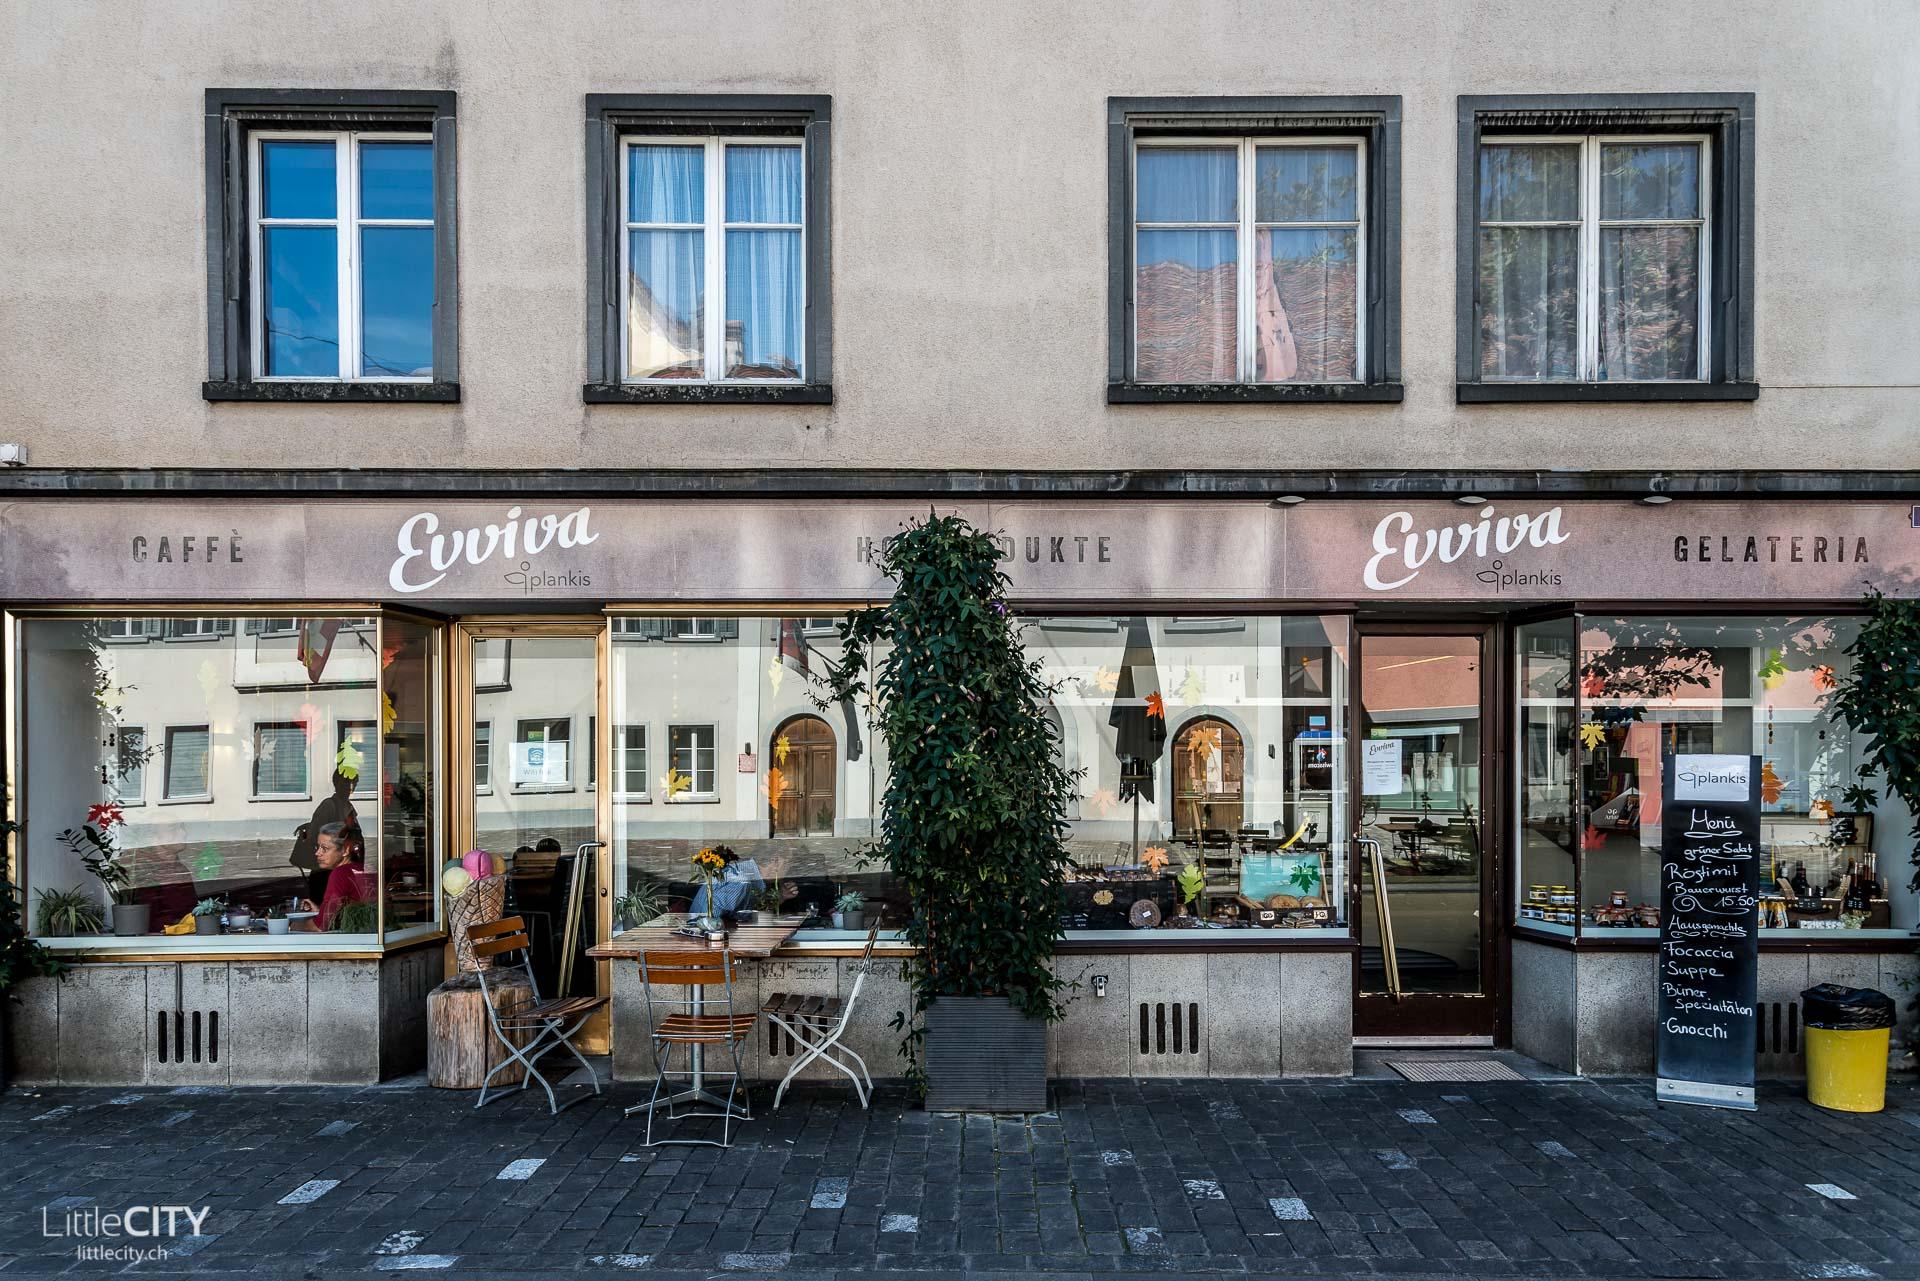 Chur Café: Evviva PlankisGelateria Caffe